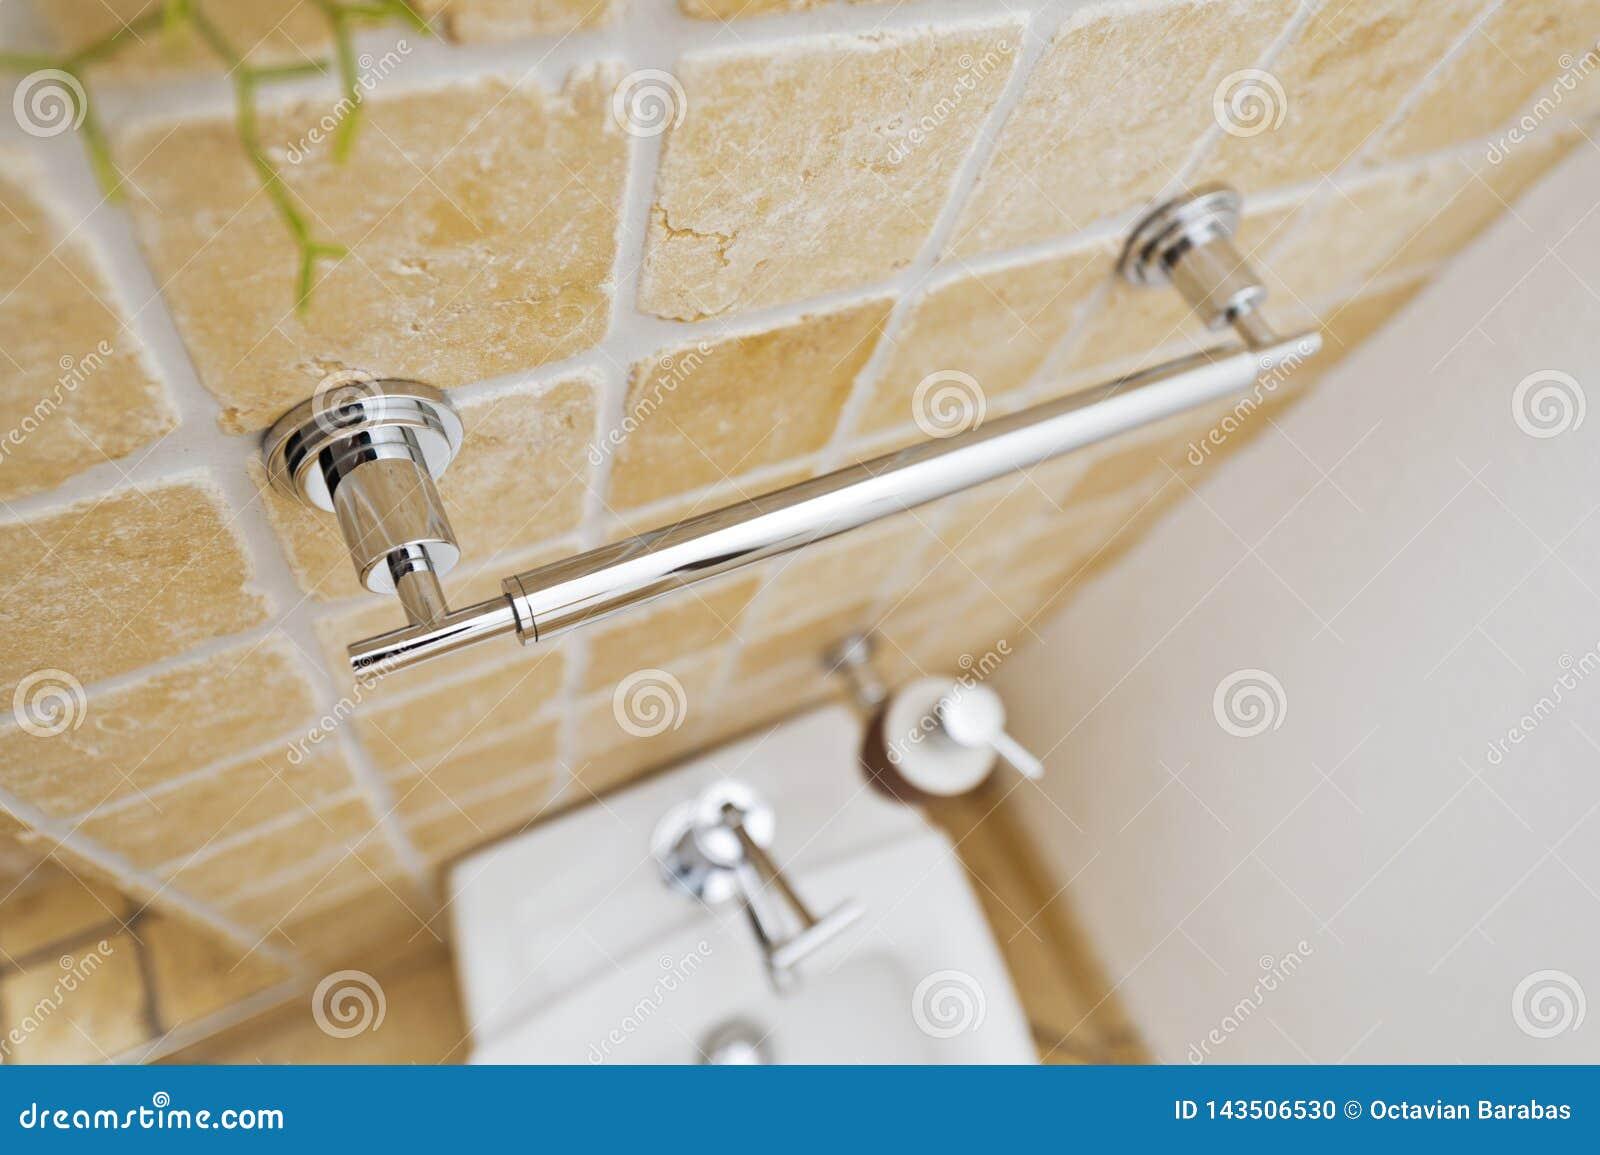 Manija de Chrome en cuarto de baño moderno